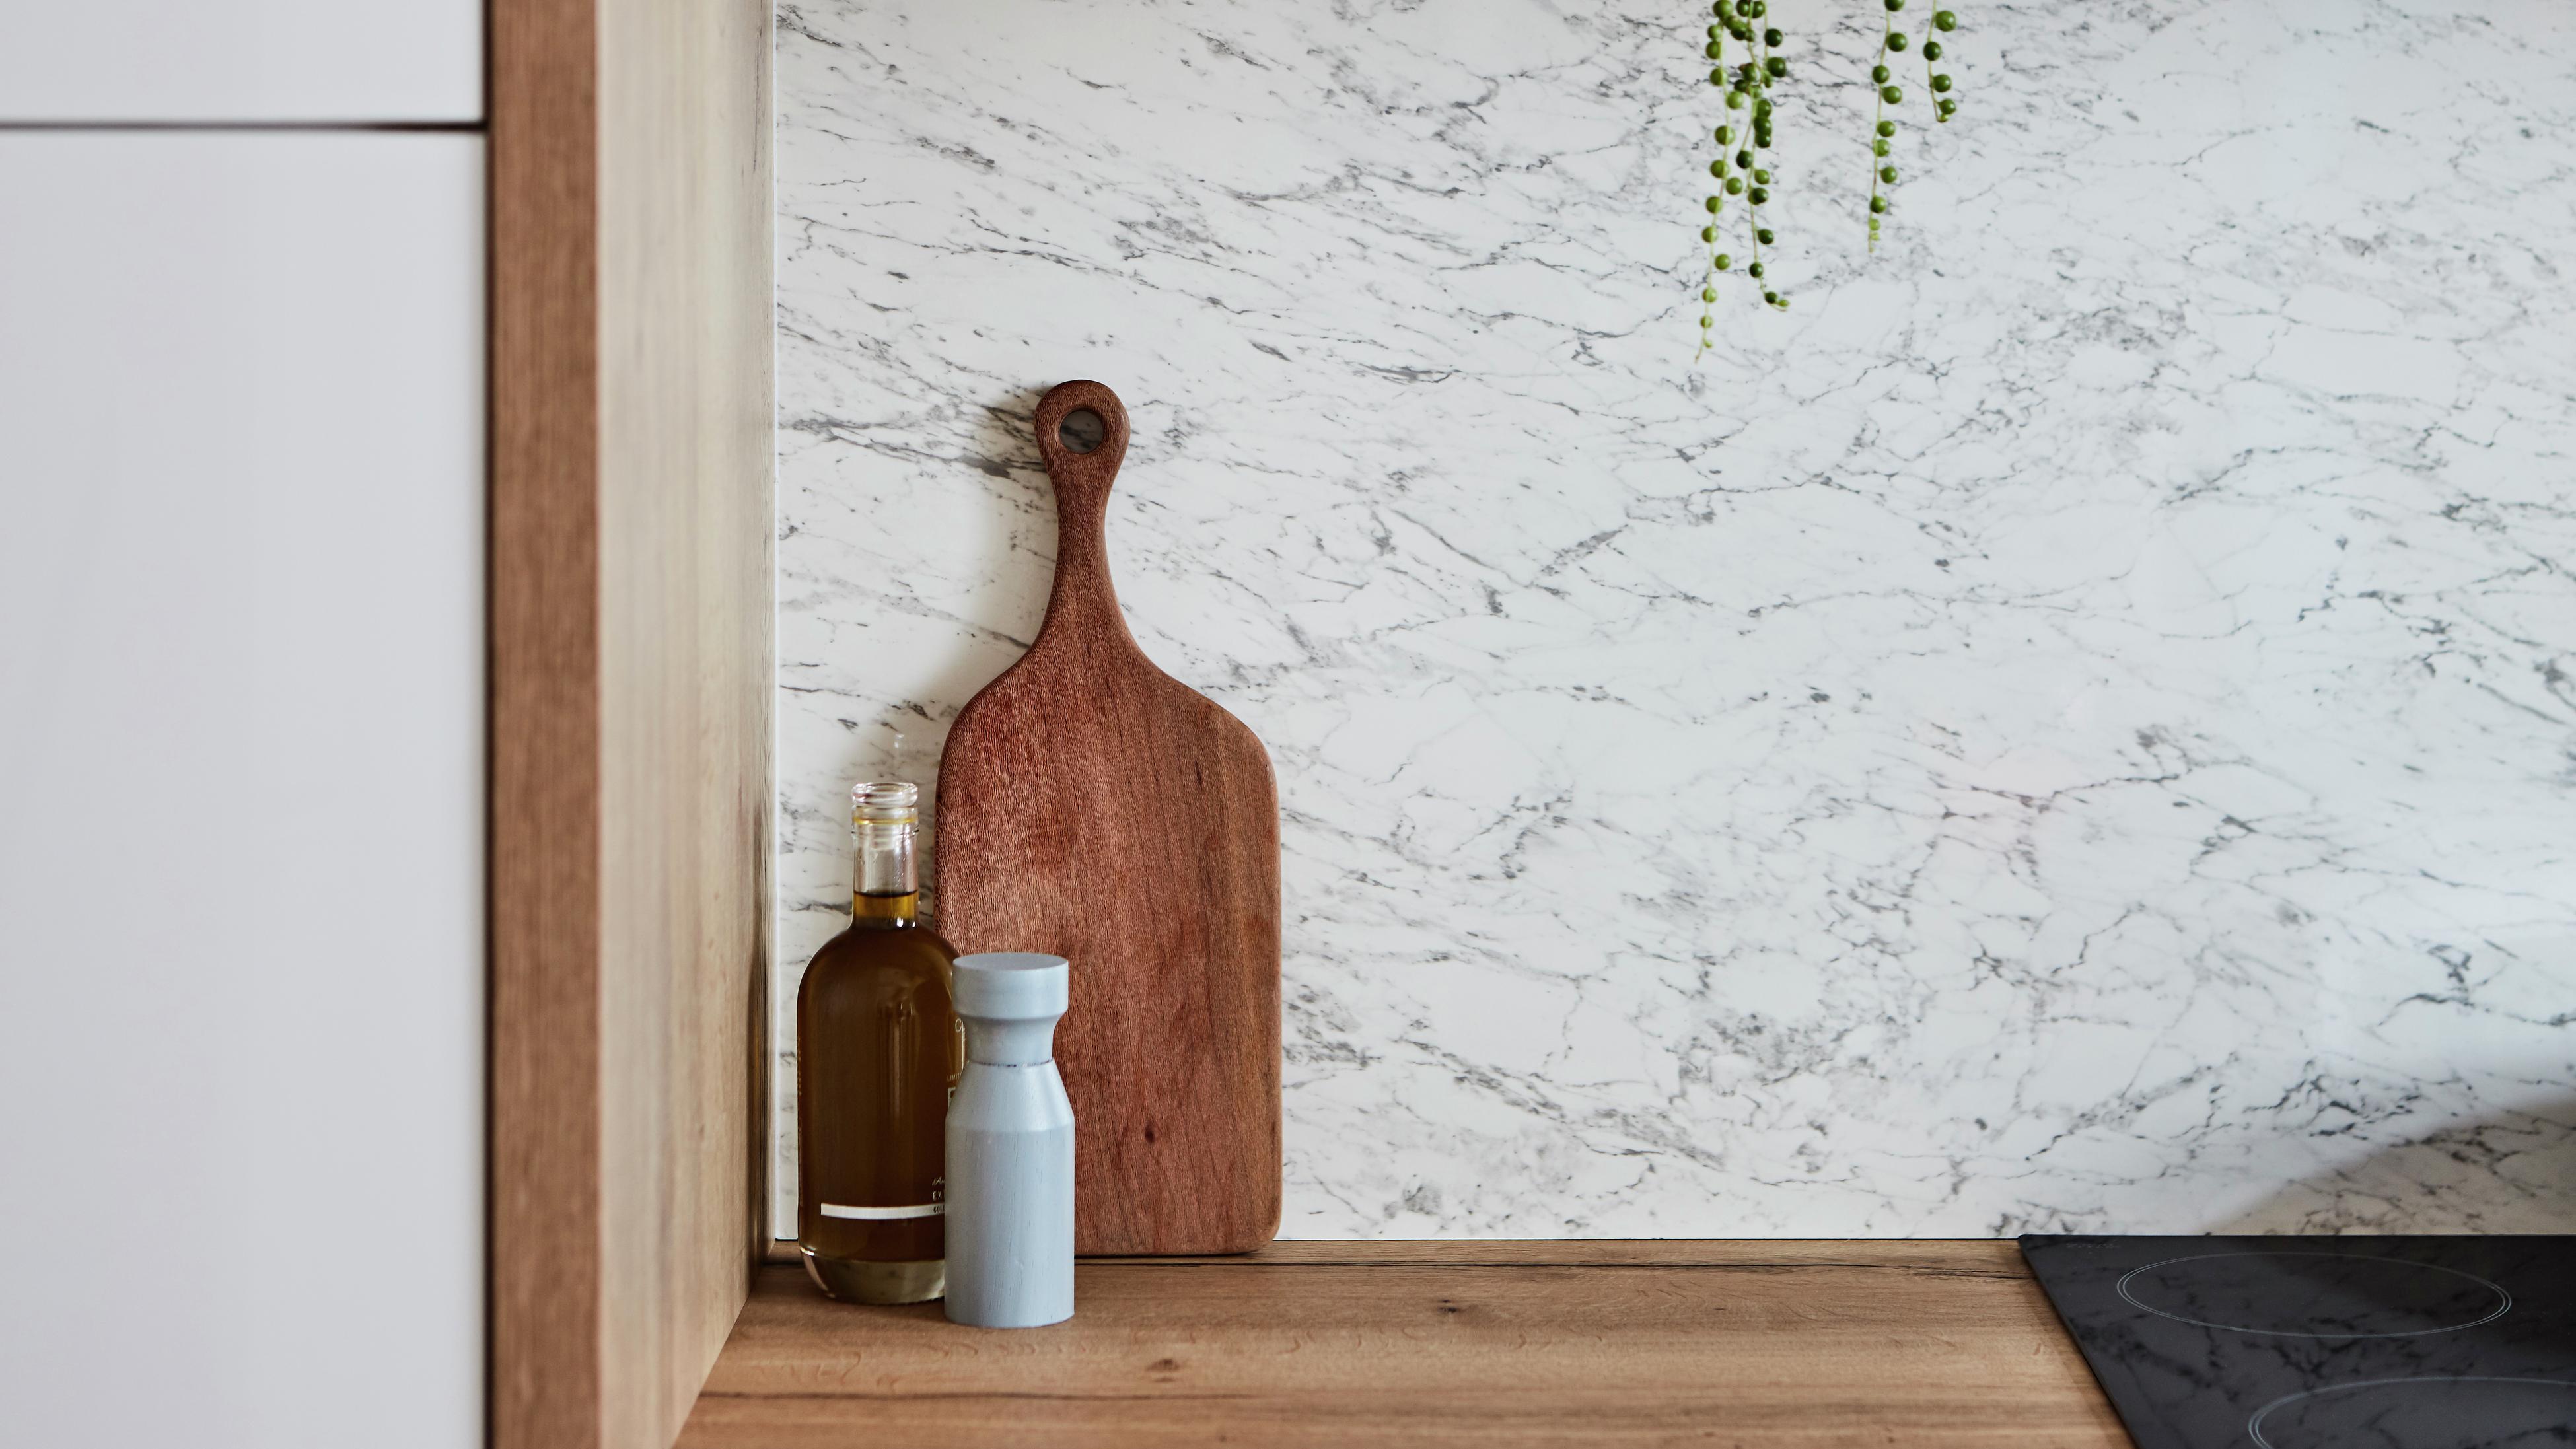 Bottle of oil, salt shaker and wooden serving platter sitting on top of wooden benchtop.